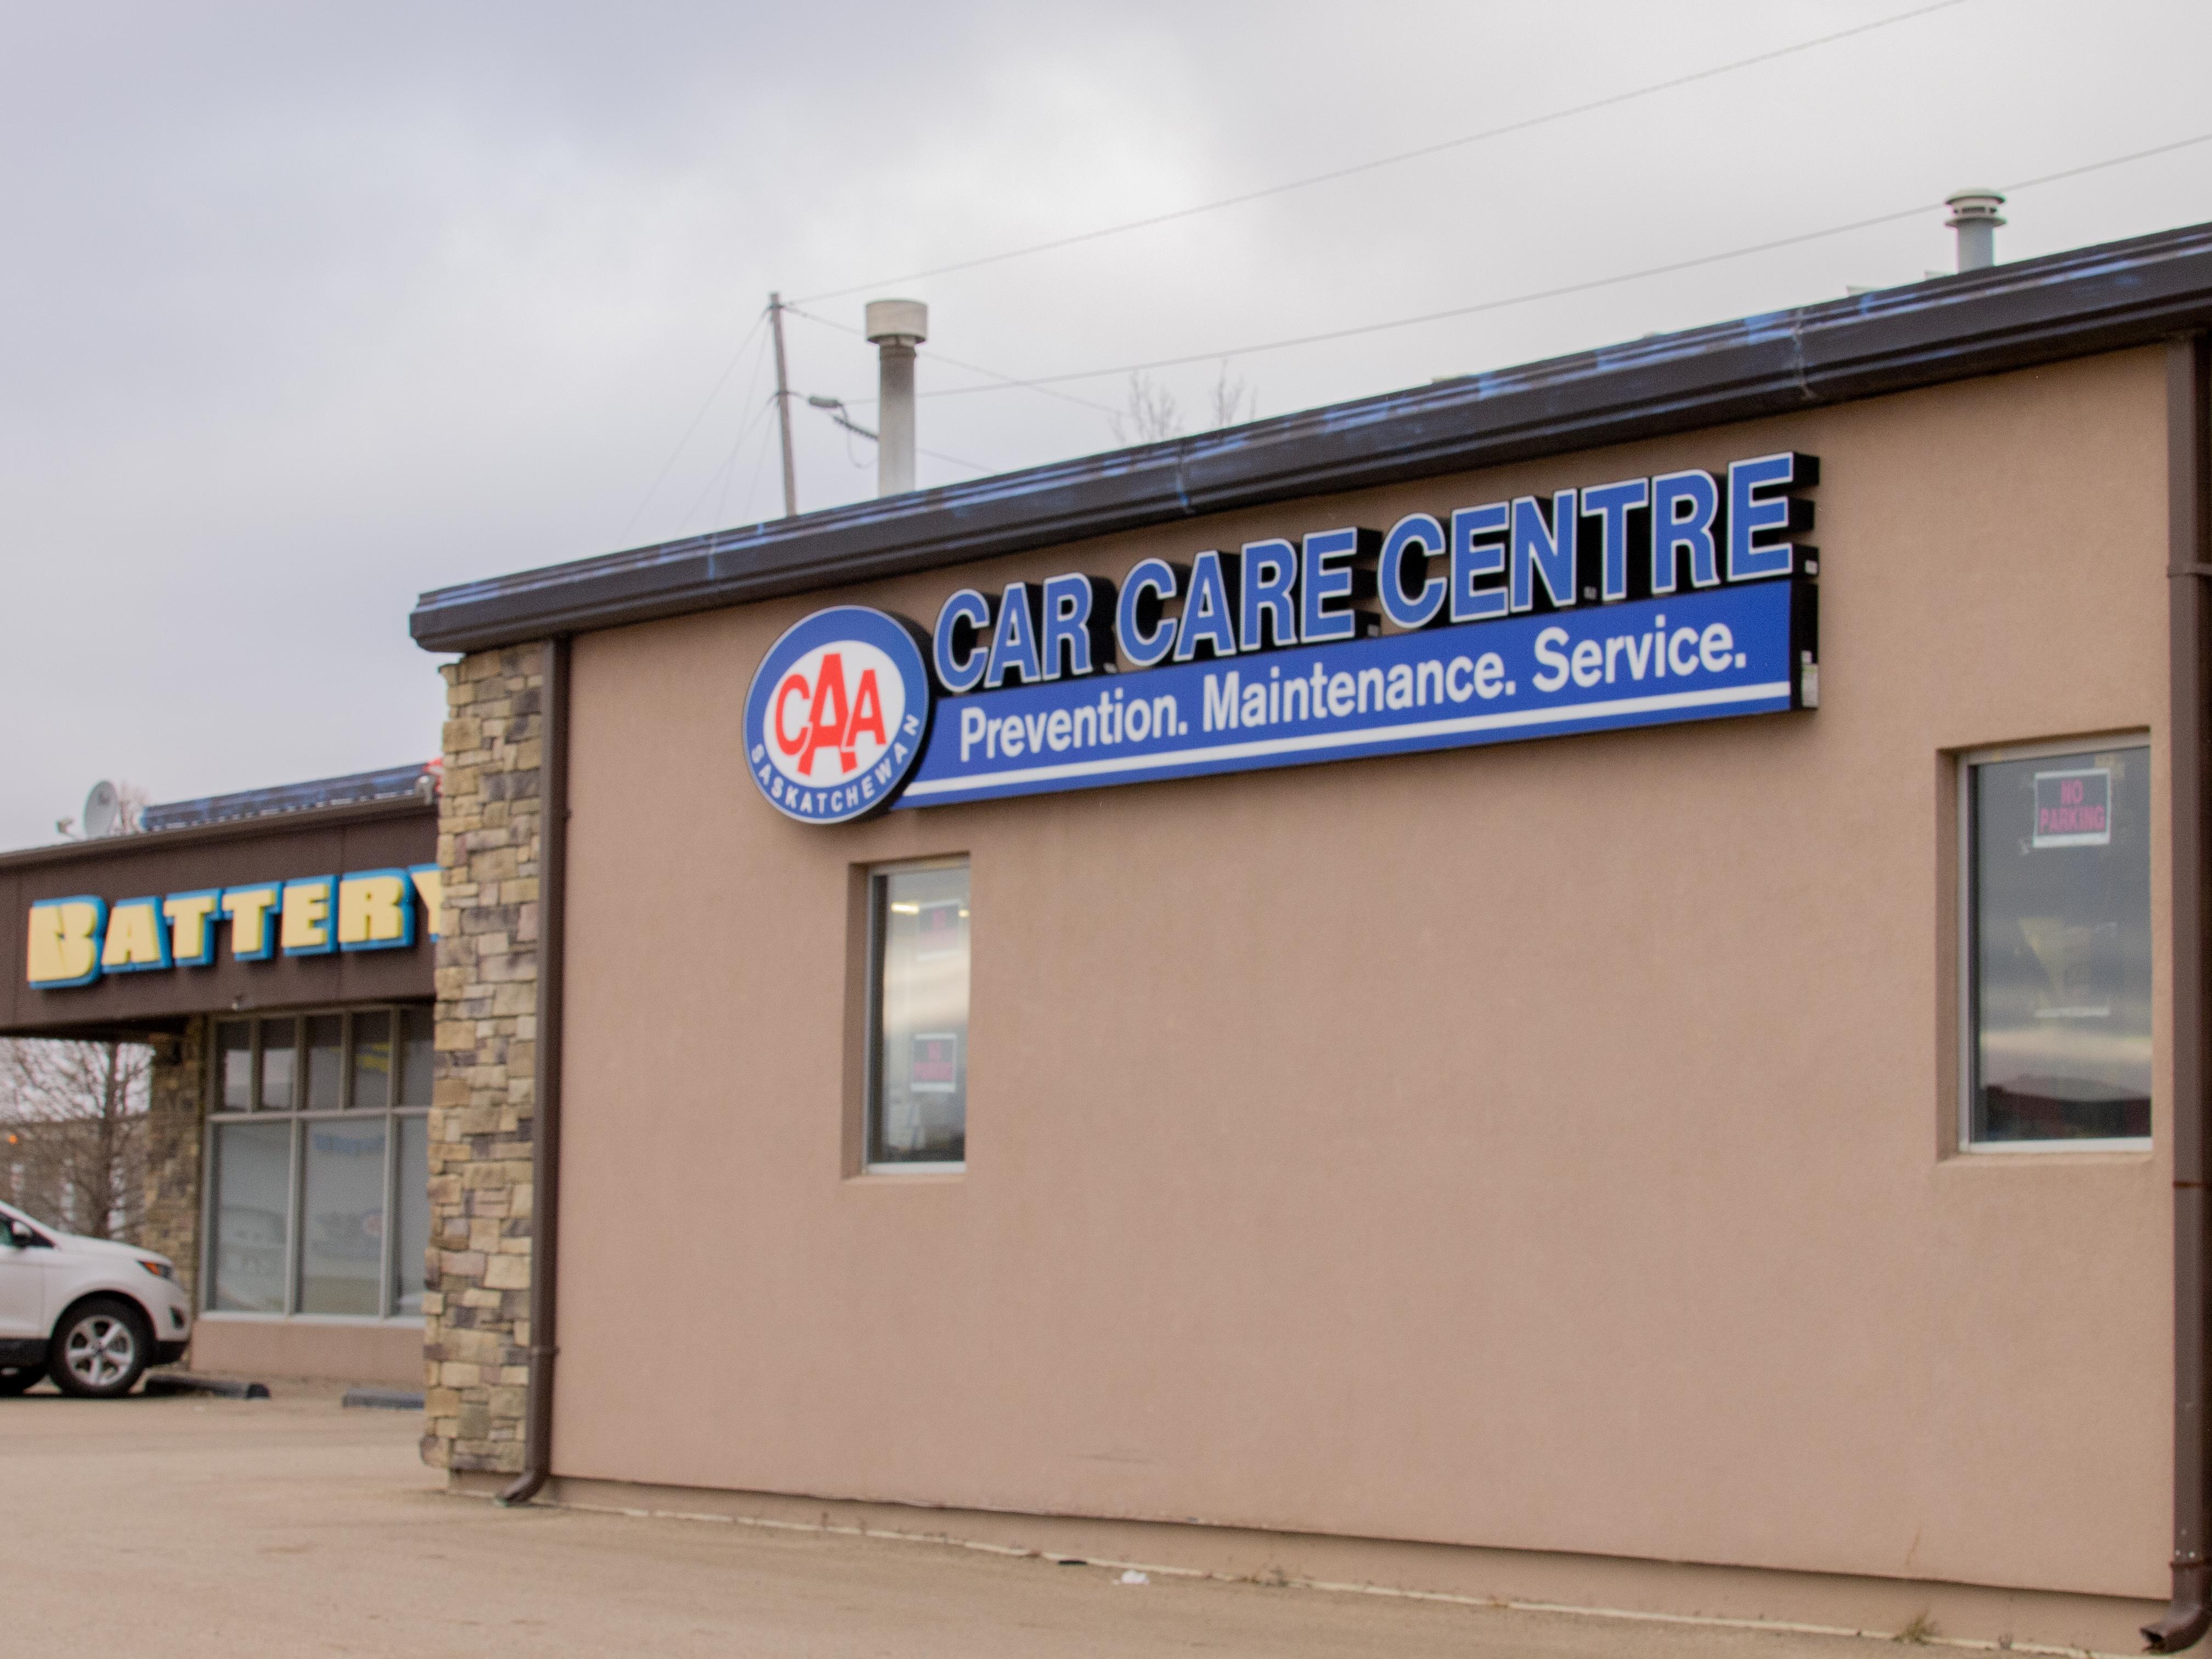 CAA Car Care Centre Regina Exterior of Building